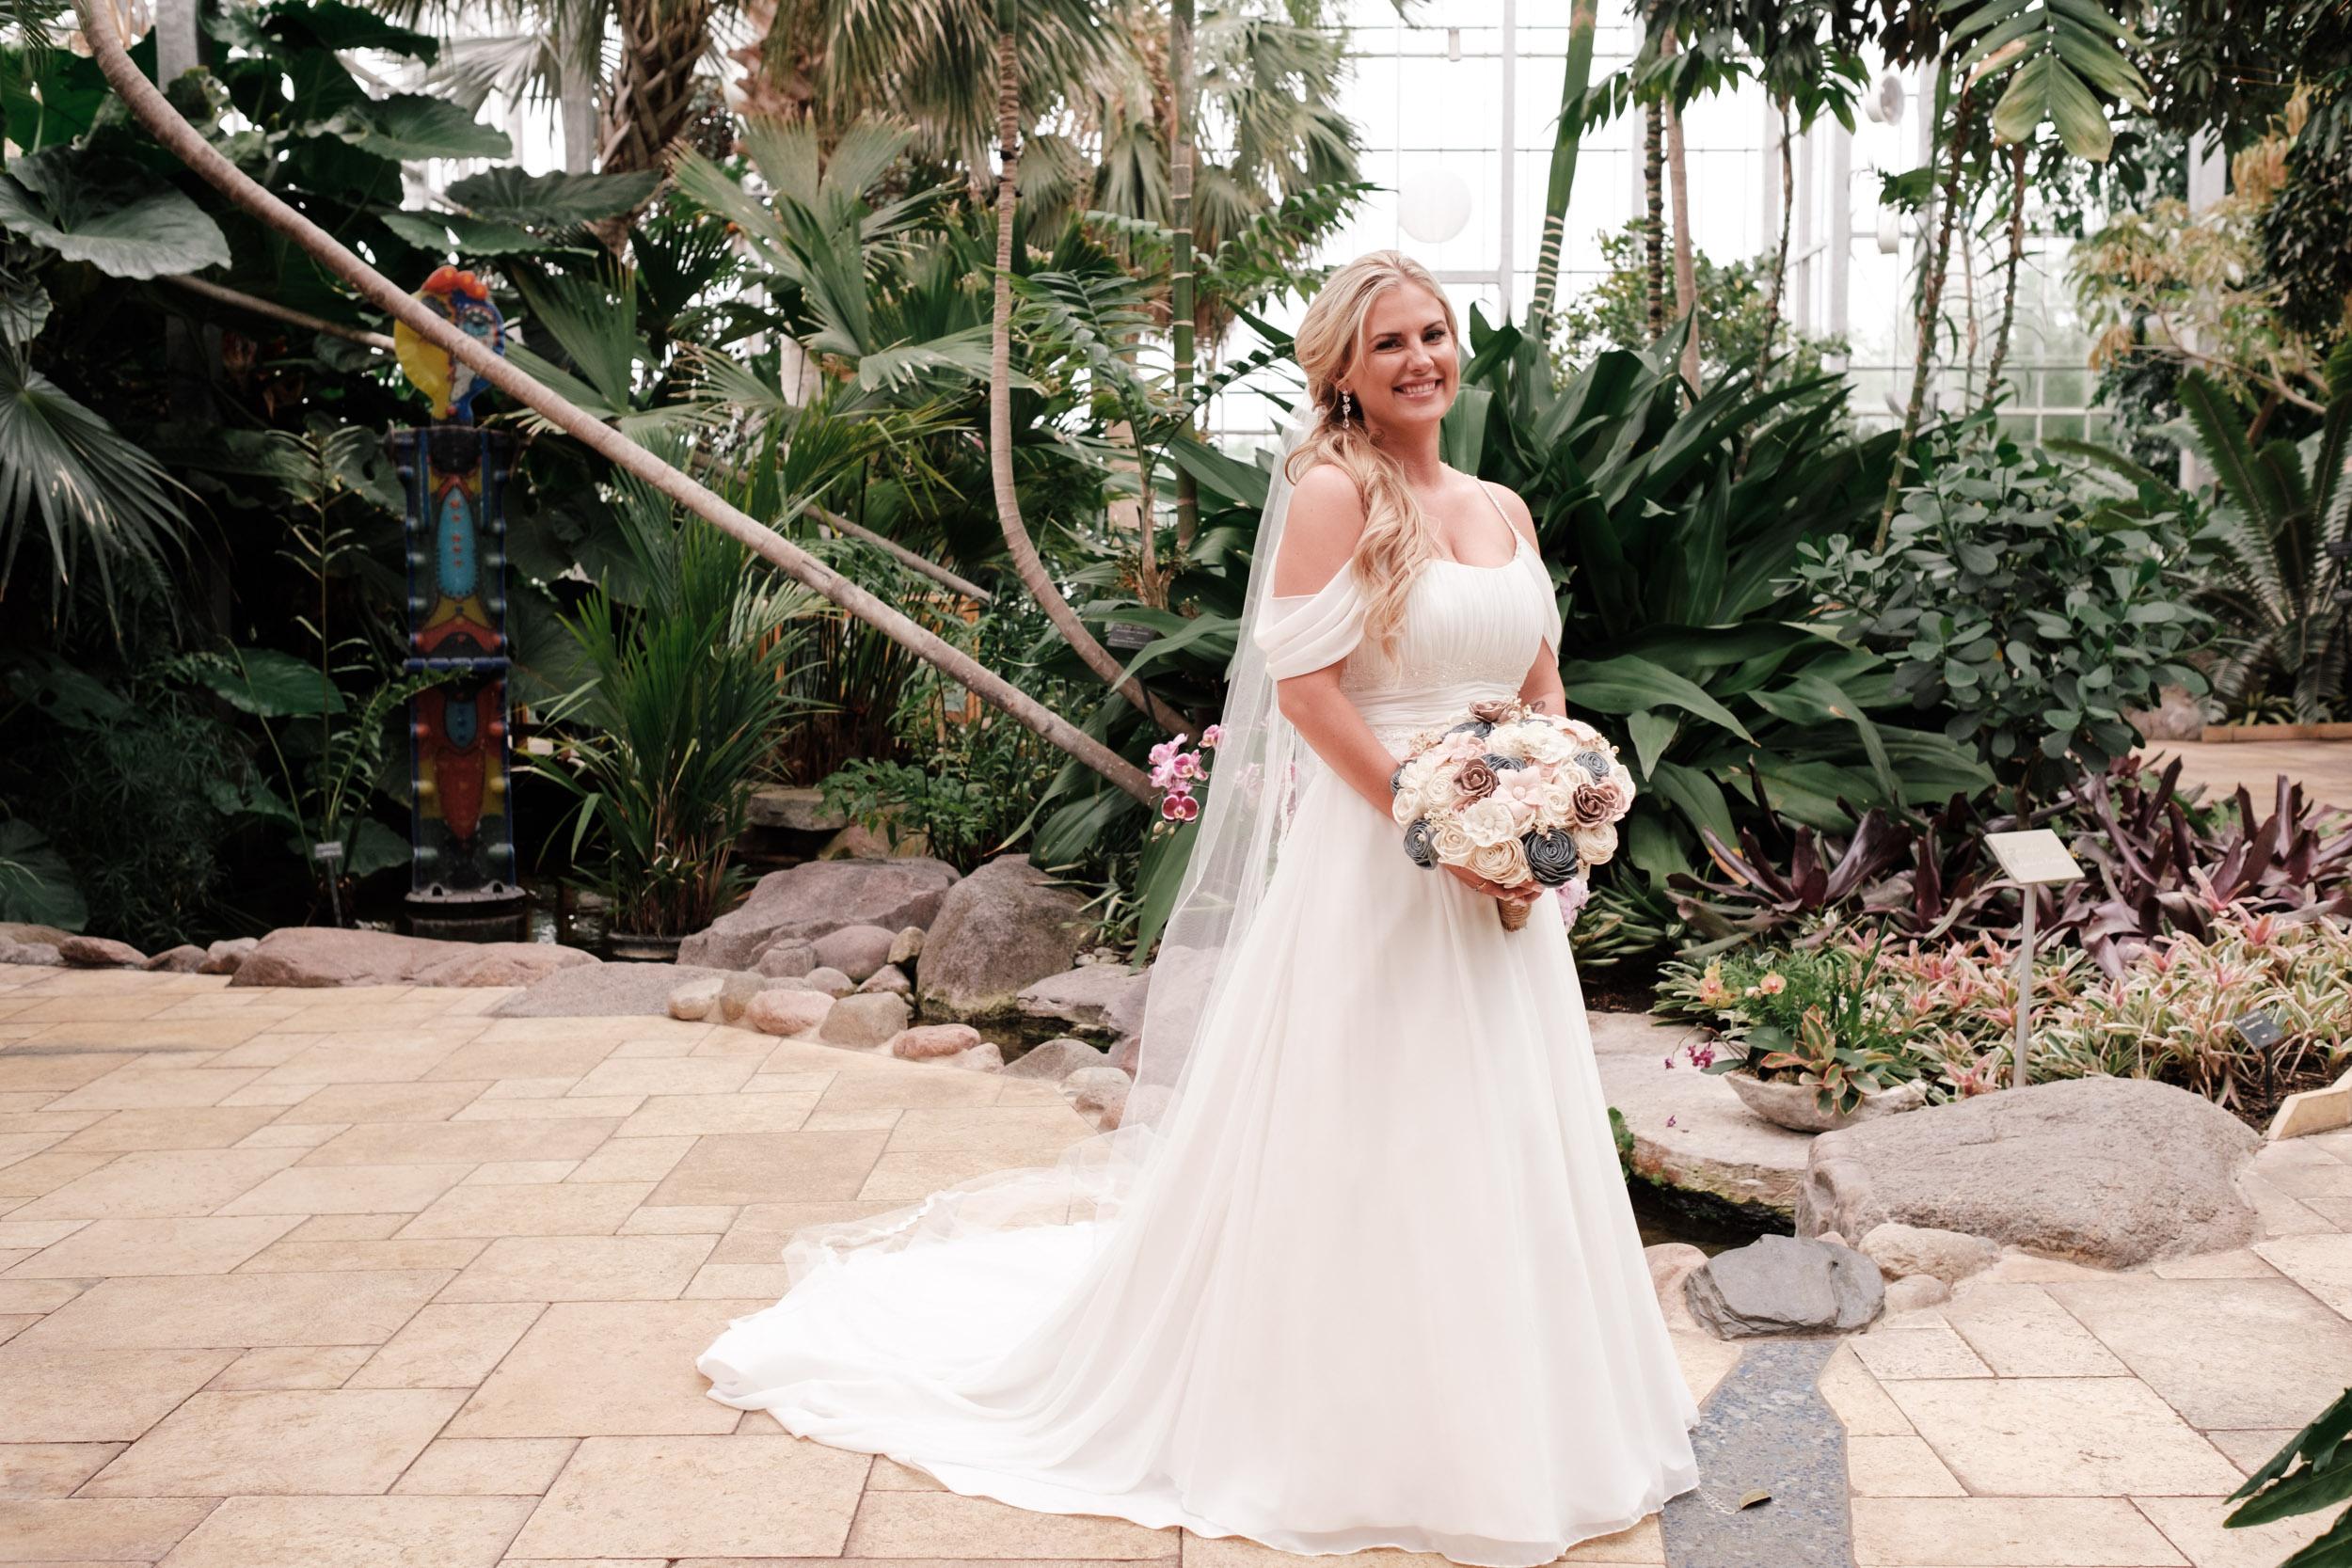 19-06-01 Megan Josh - Nicholas Conservatory Wedding-29.jpg